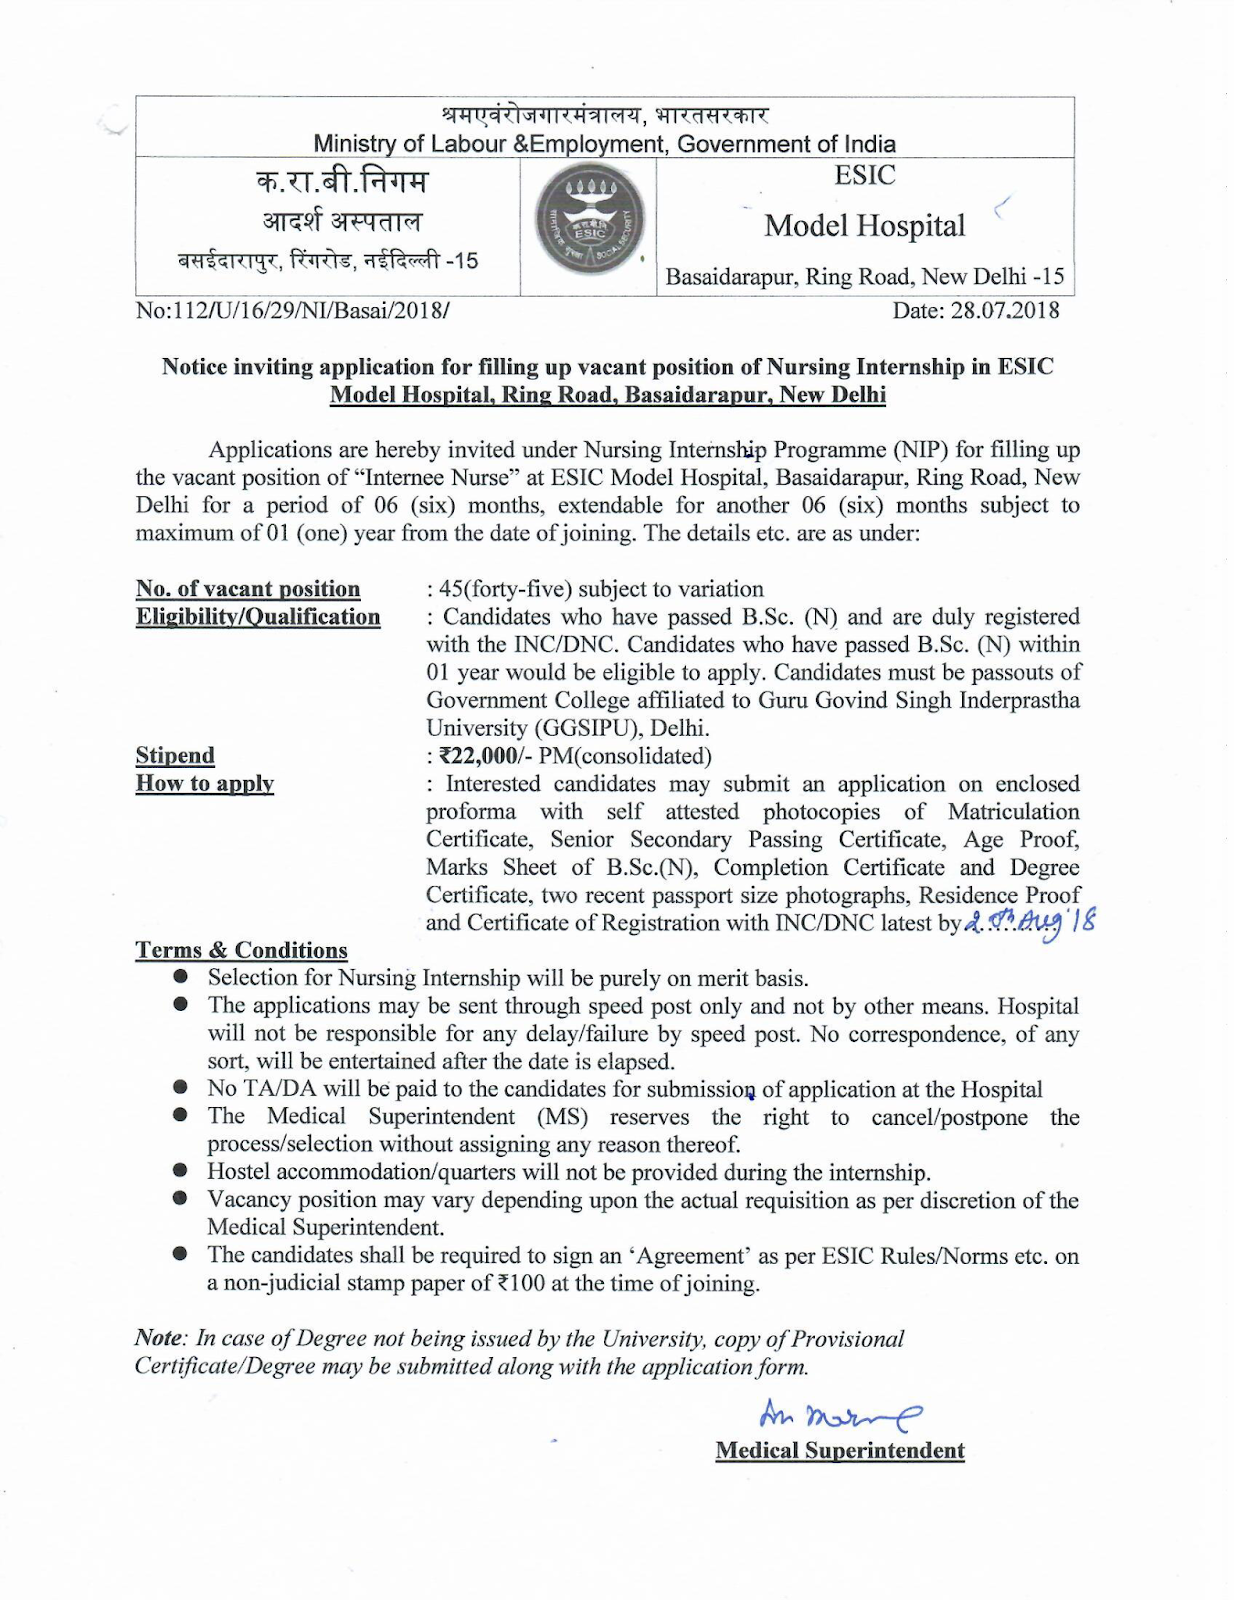 NURSING JOBS: ESIC Staff Nurses Recruitment- 45 Vacancies